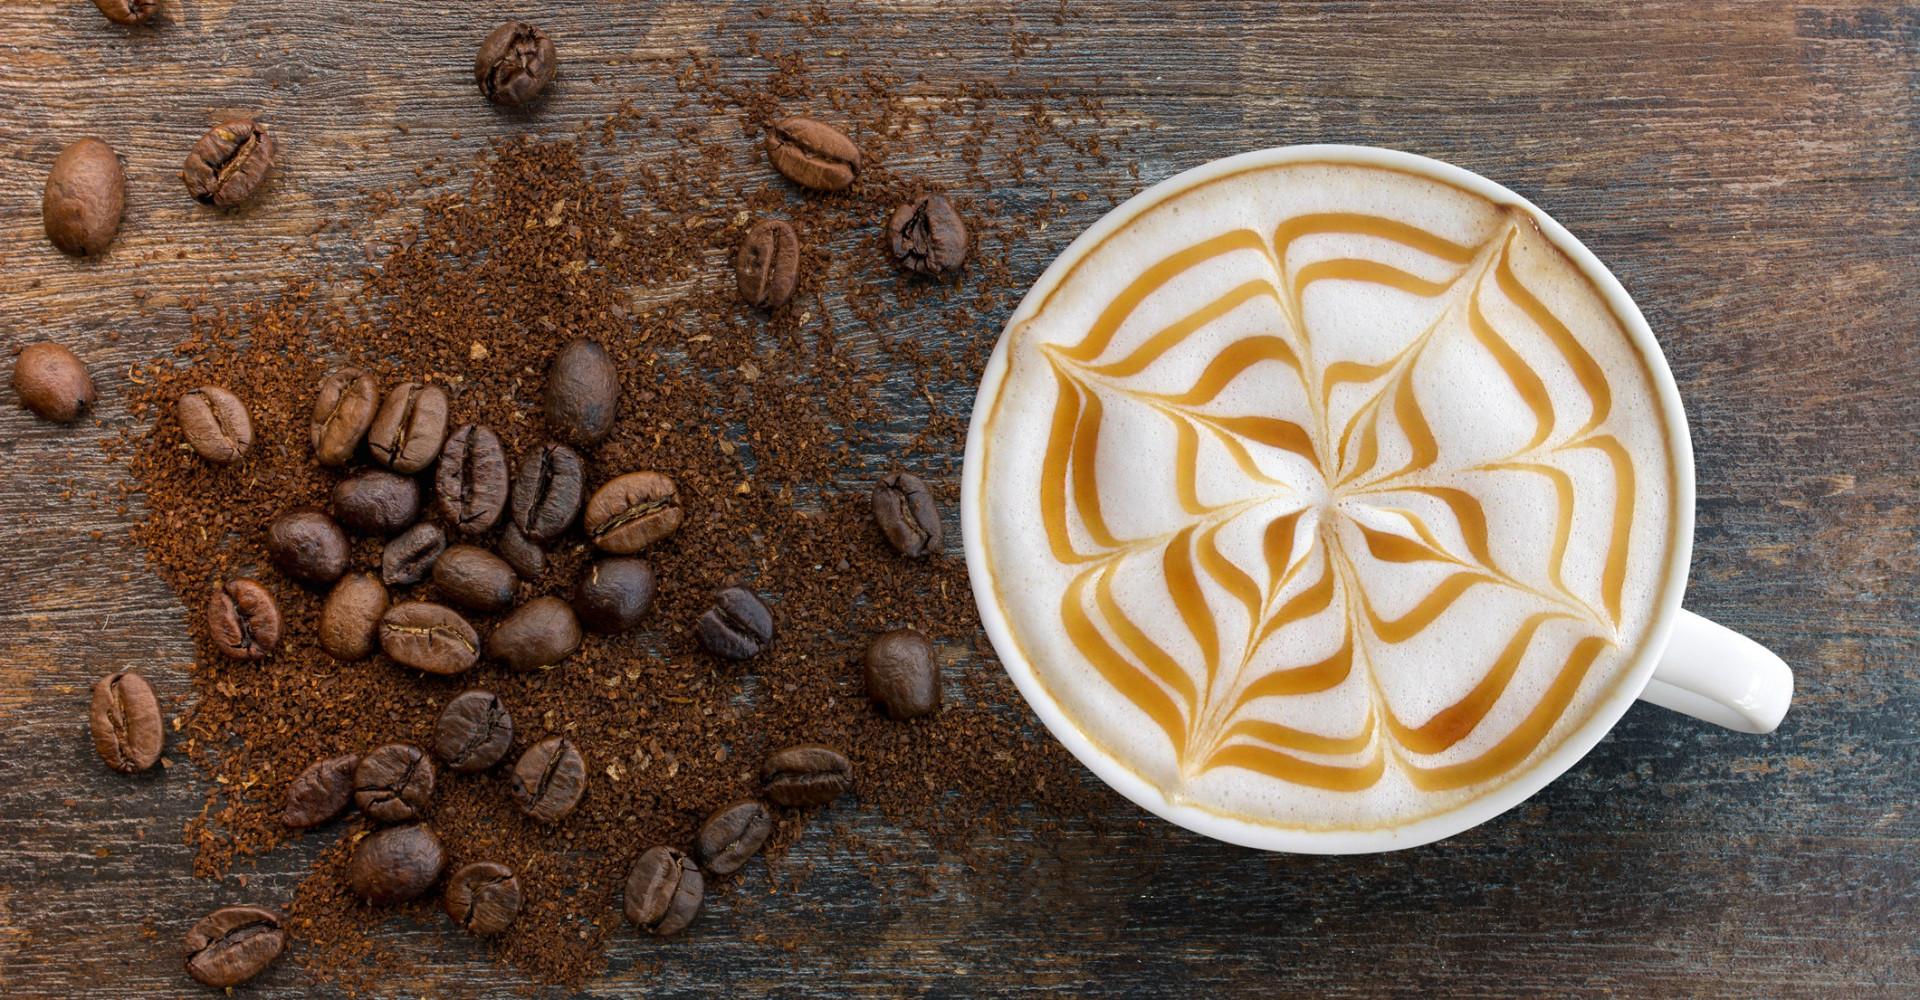 Deze latte artiest maakt 3D koffieontwerpen